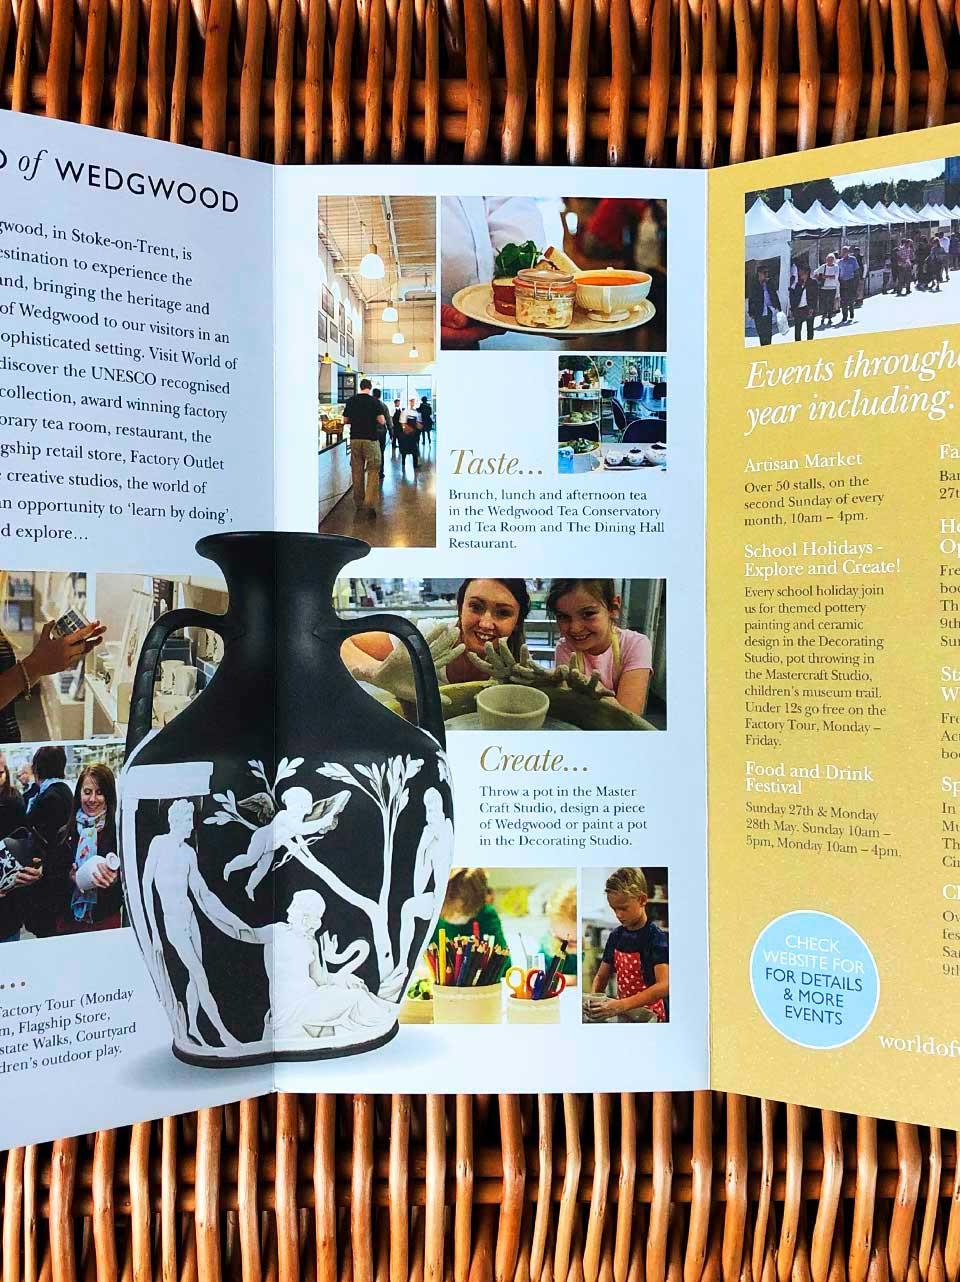 Activity Leaflet for World of Wedgwood